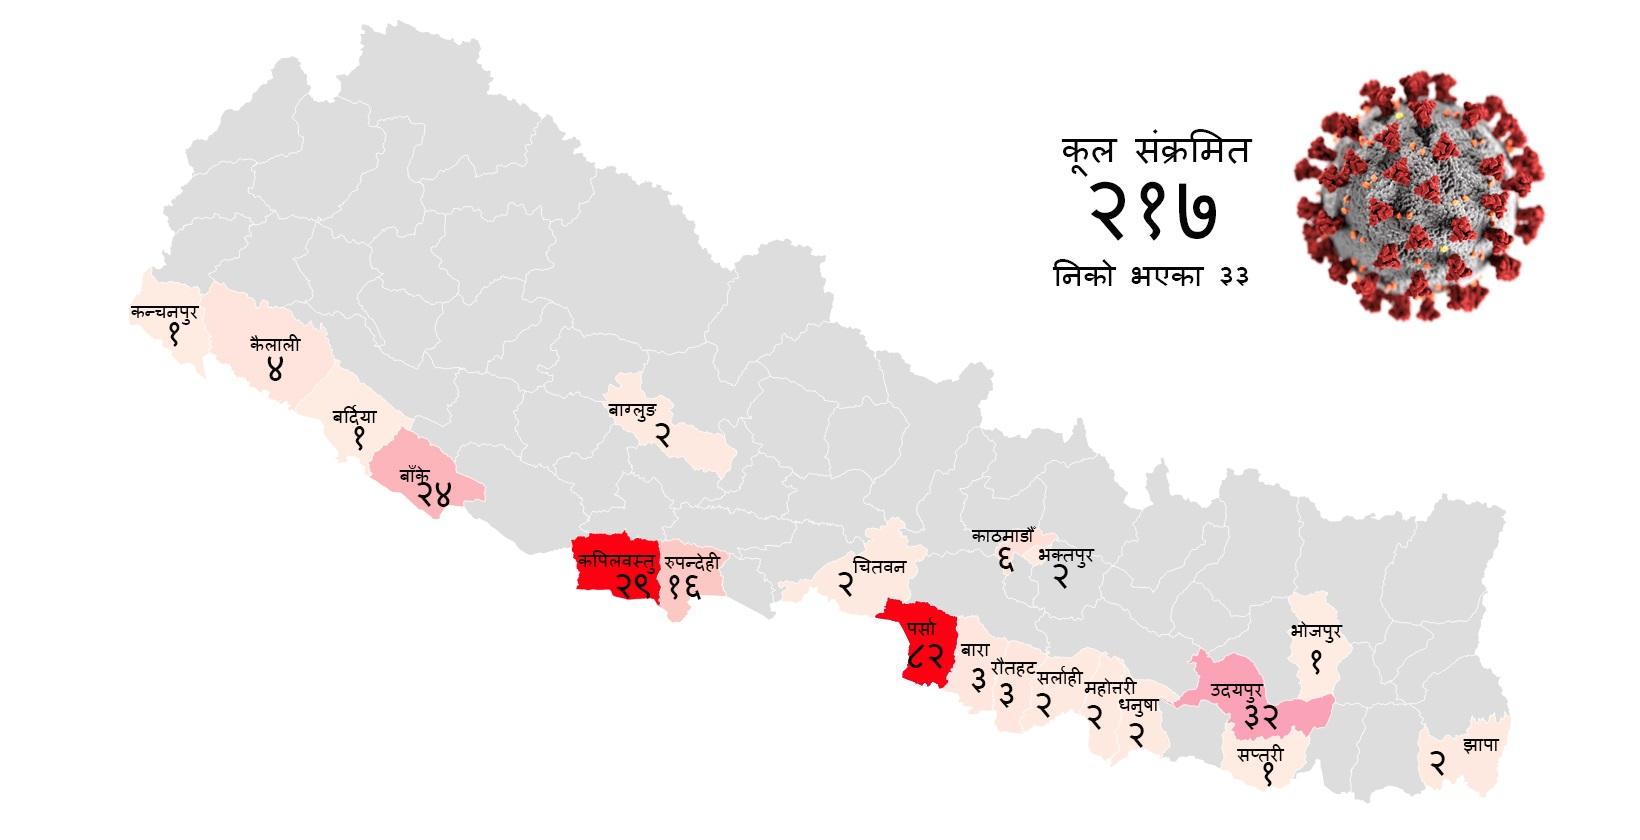 nepal district coronavirus covid-19 confirmed 217 people